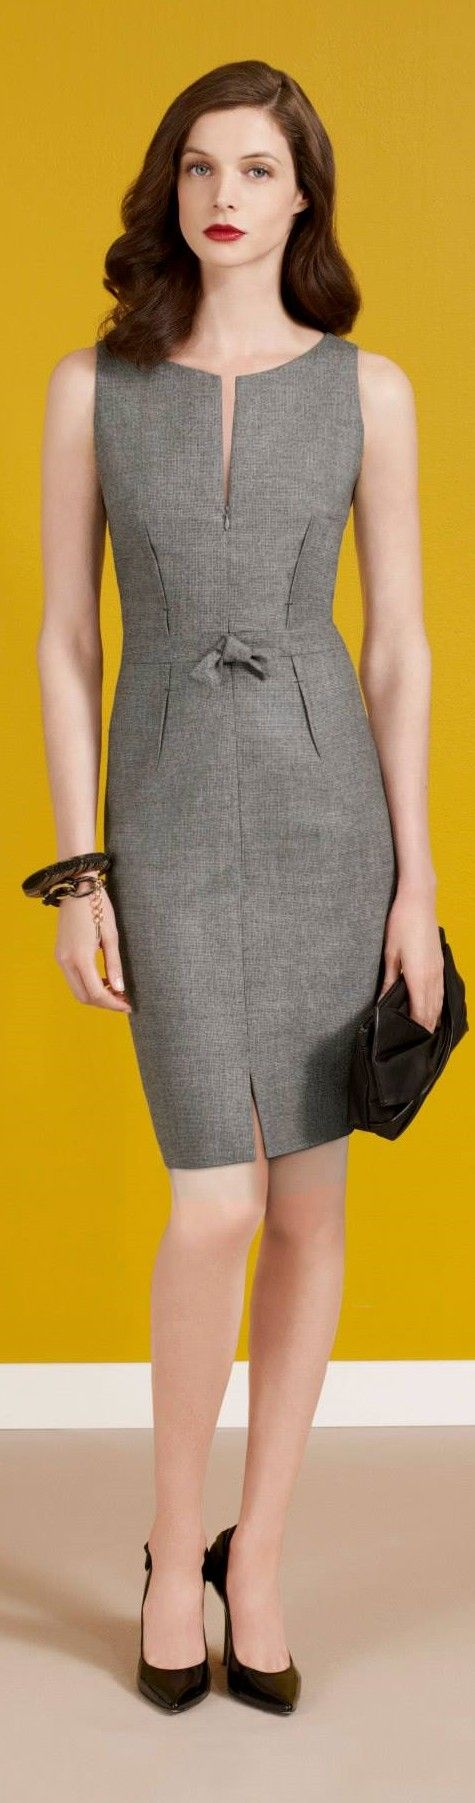 Paule Ka 2015 gray dress. Fall autumn women fashion outfit clothing stylish apparel @roressclothes closet ideas